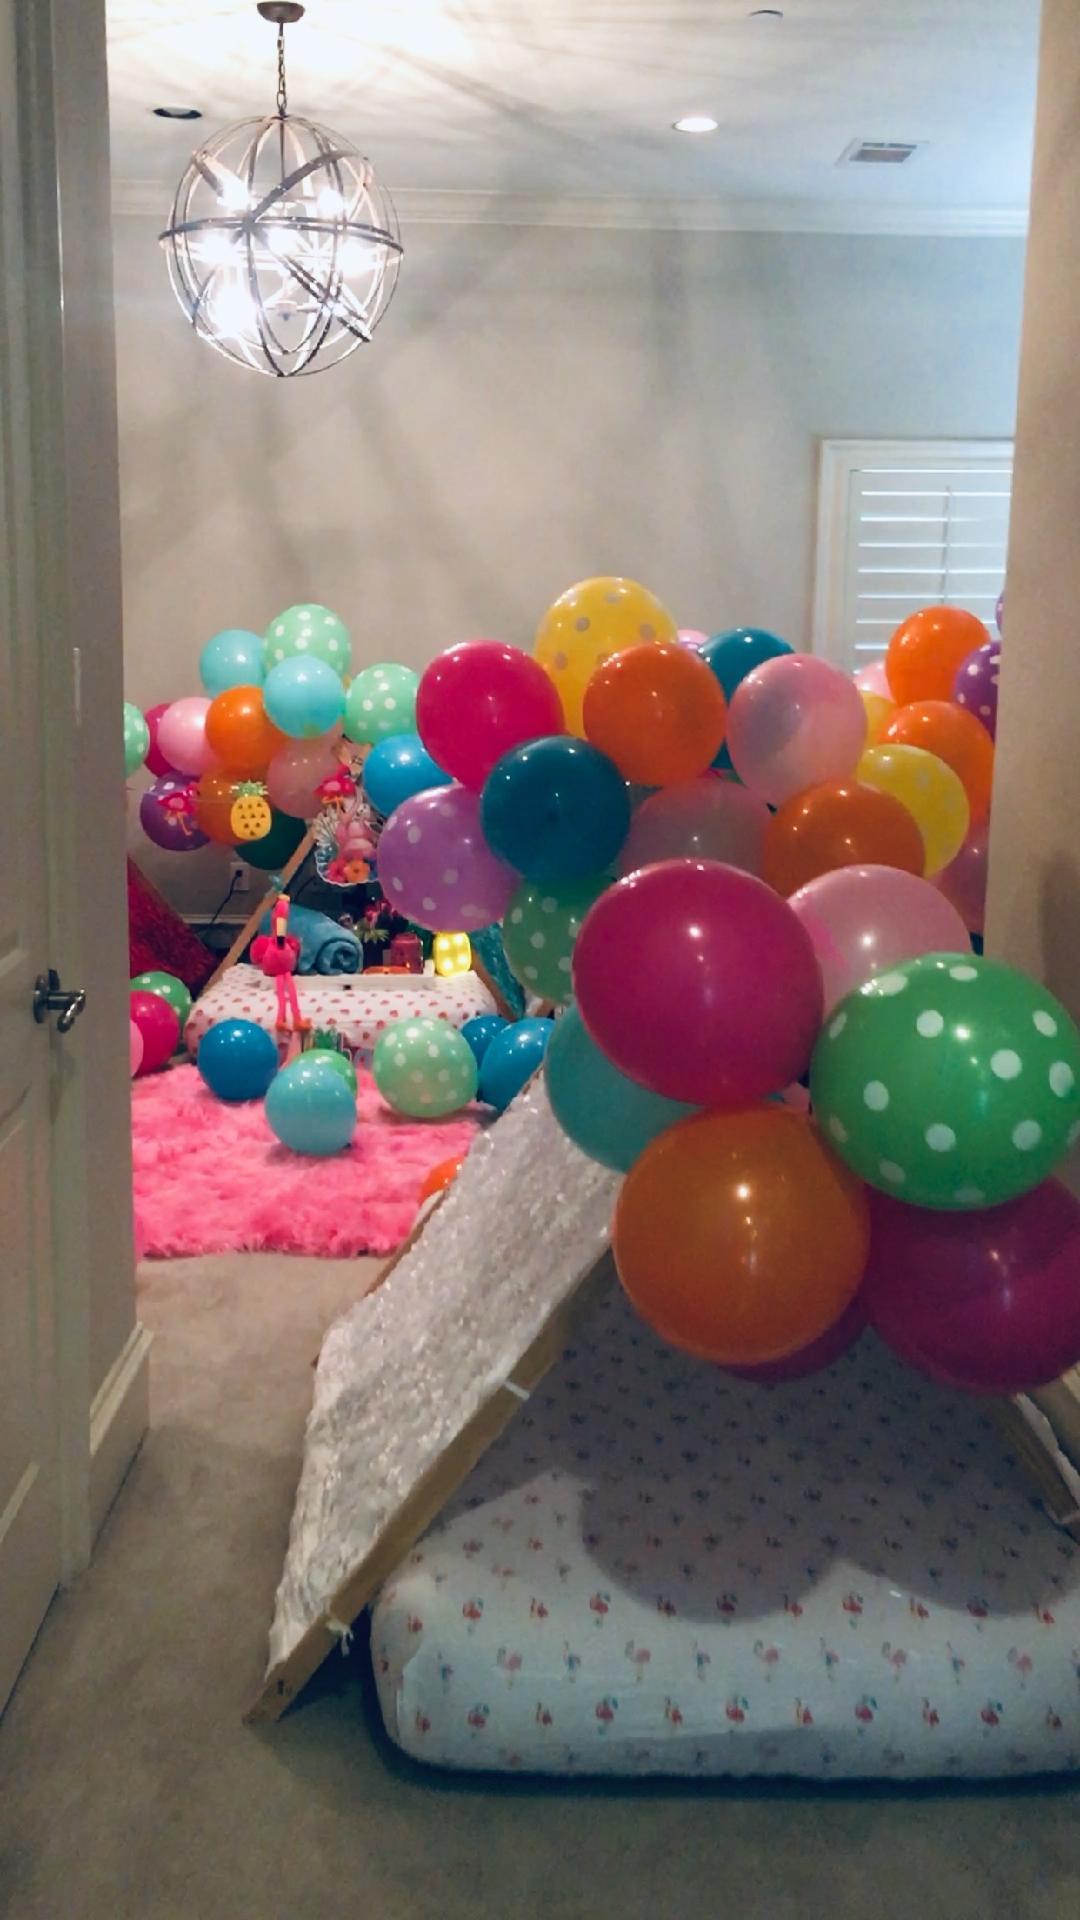 houston kids birthday teepee party tent rentals 9.jpg